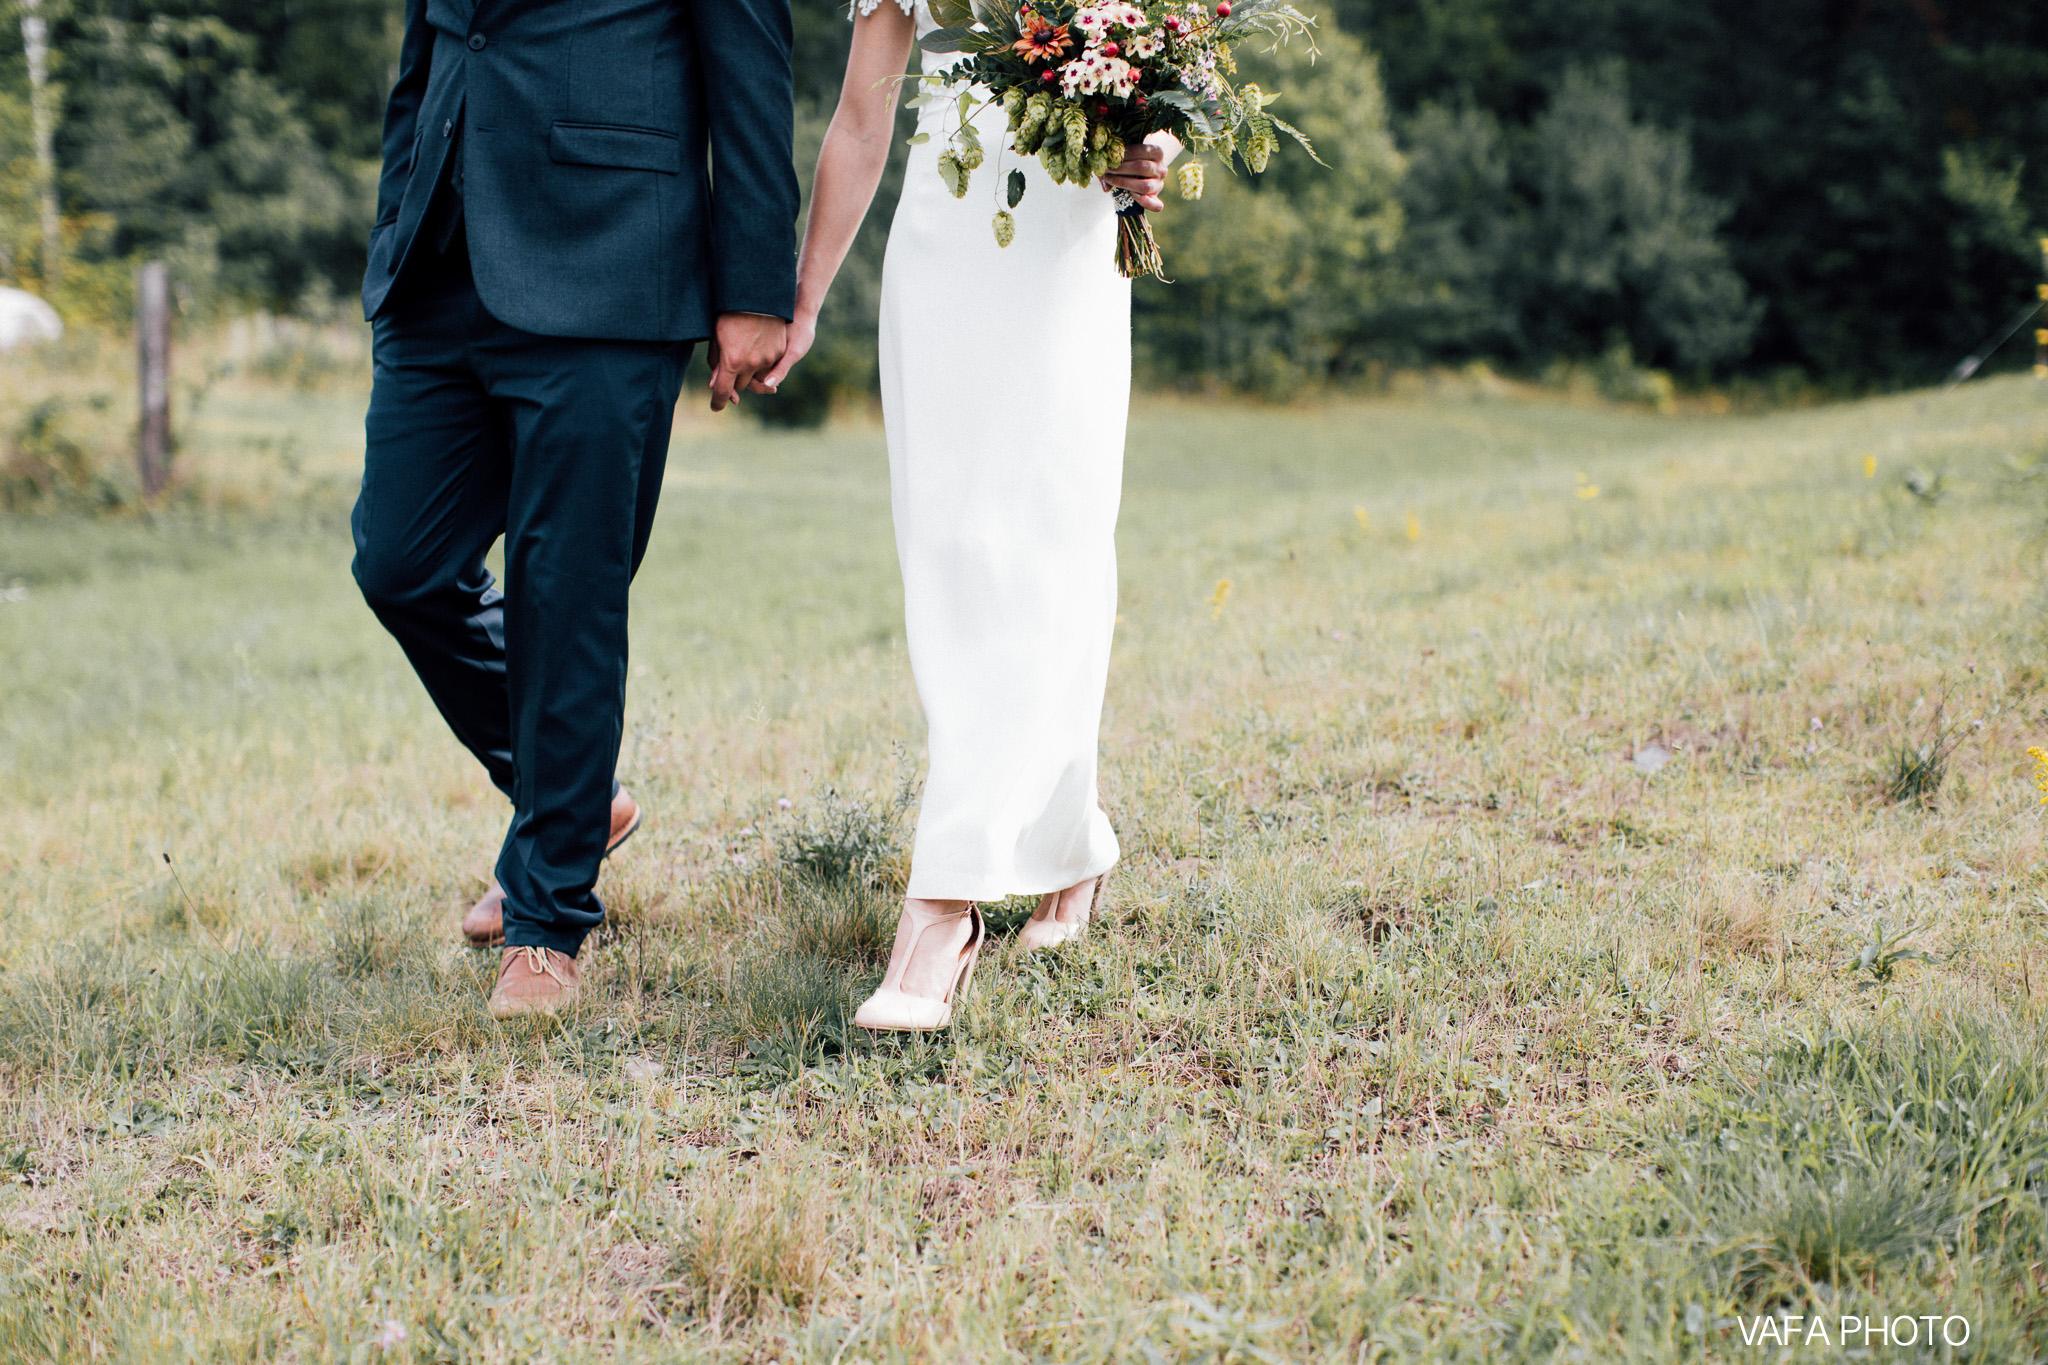 Belsolda-Farm-Wedding-Christy-Eric-Vafa-Photo-164.jpg